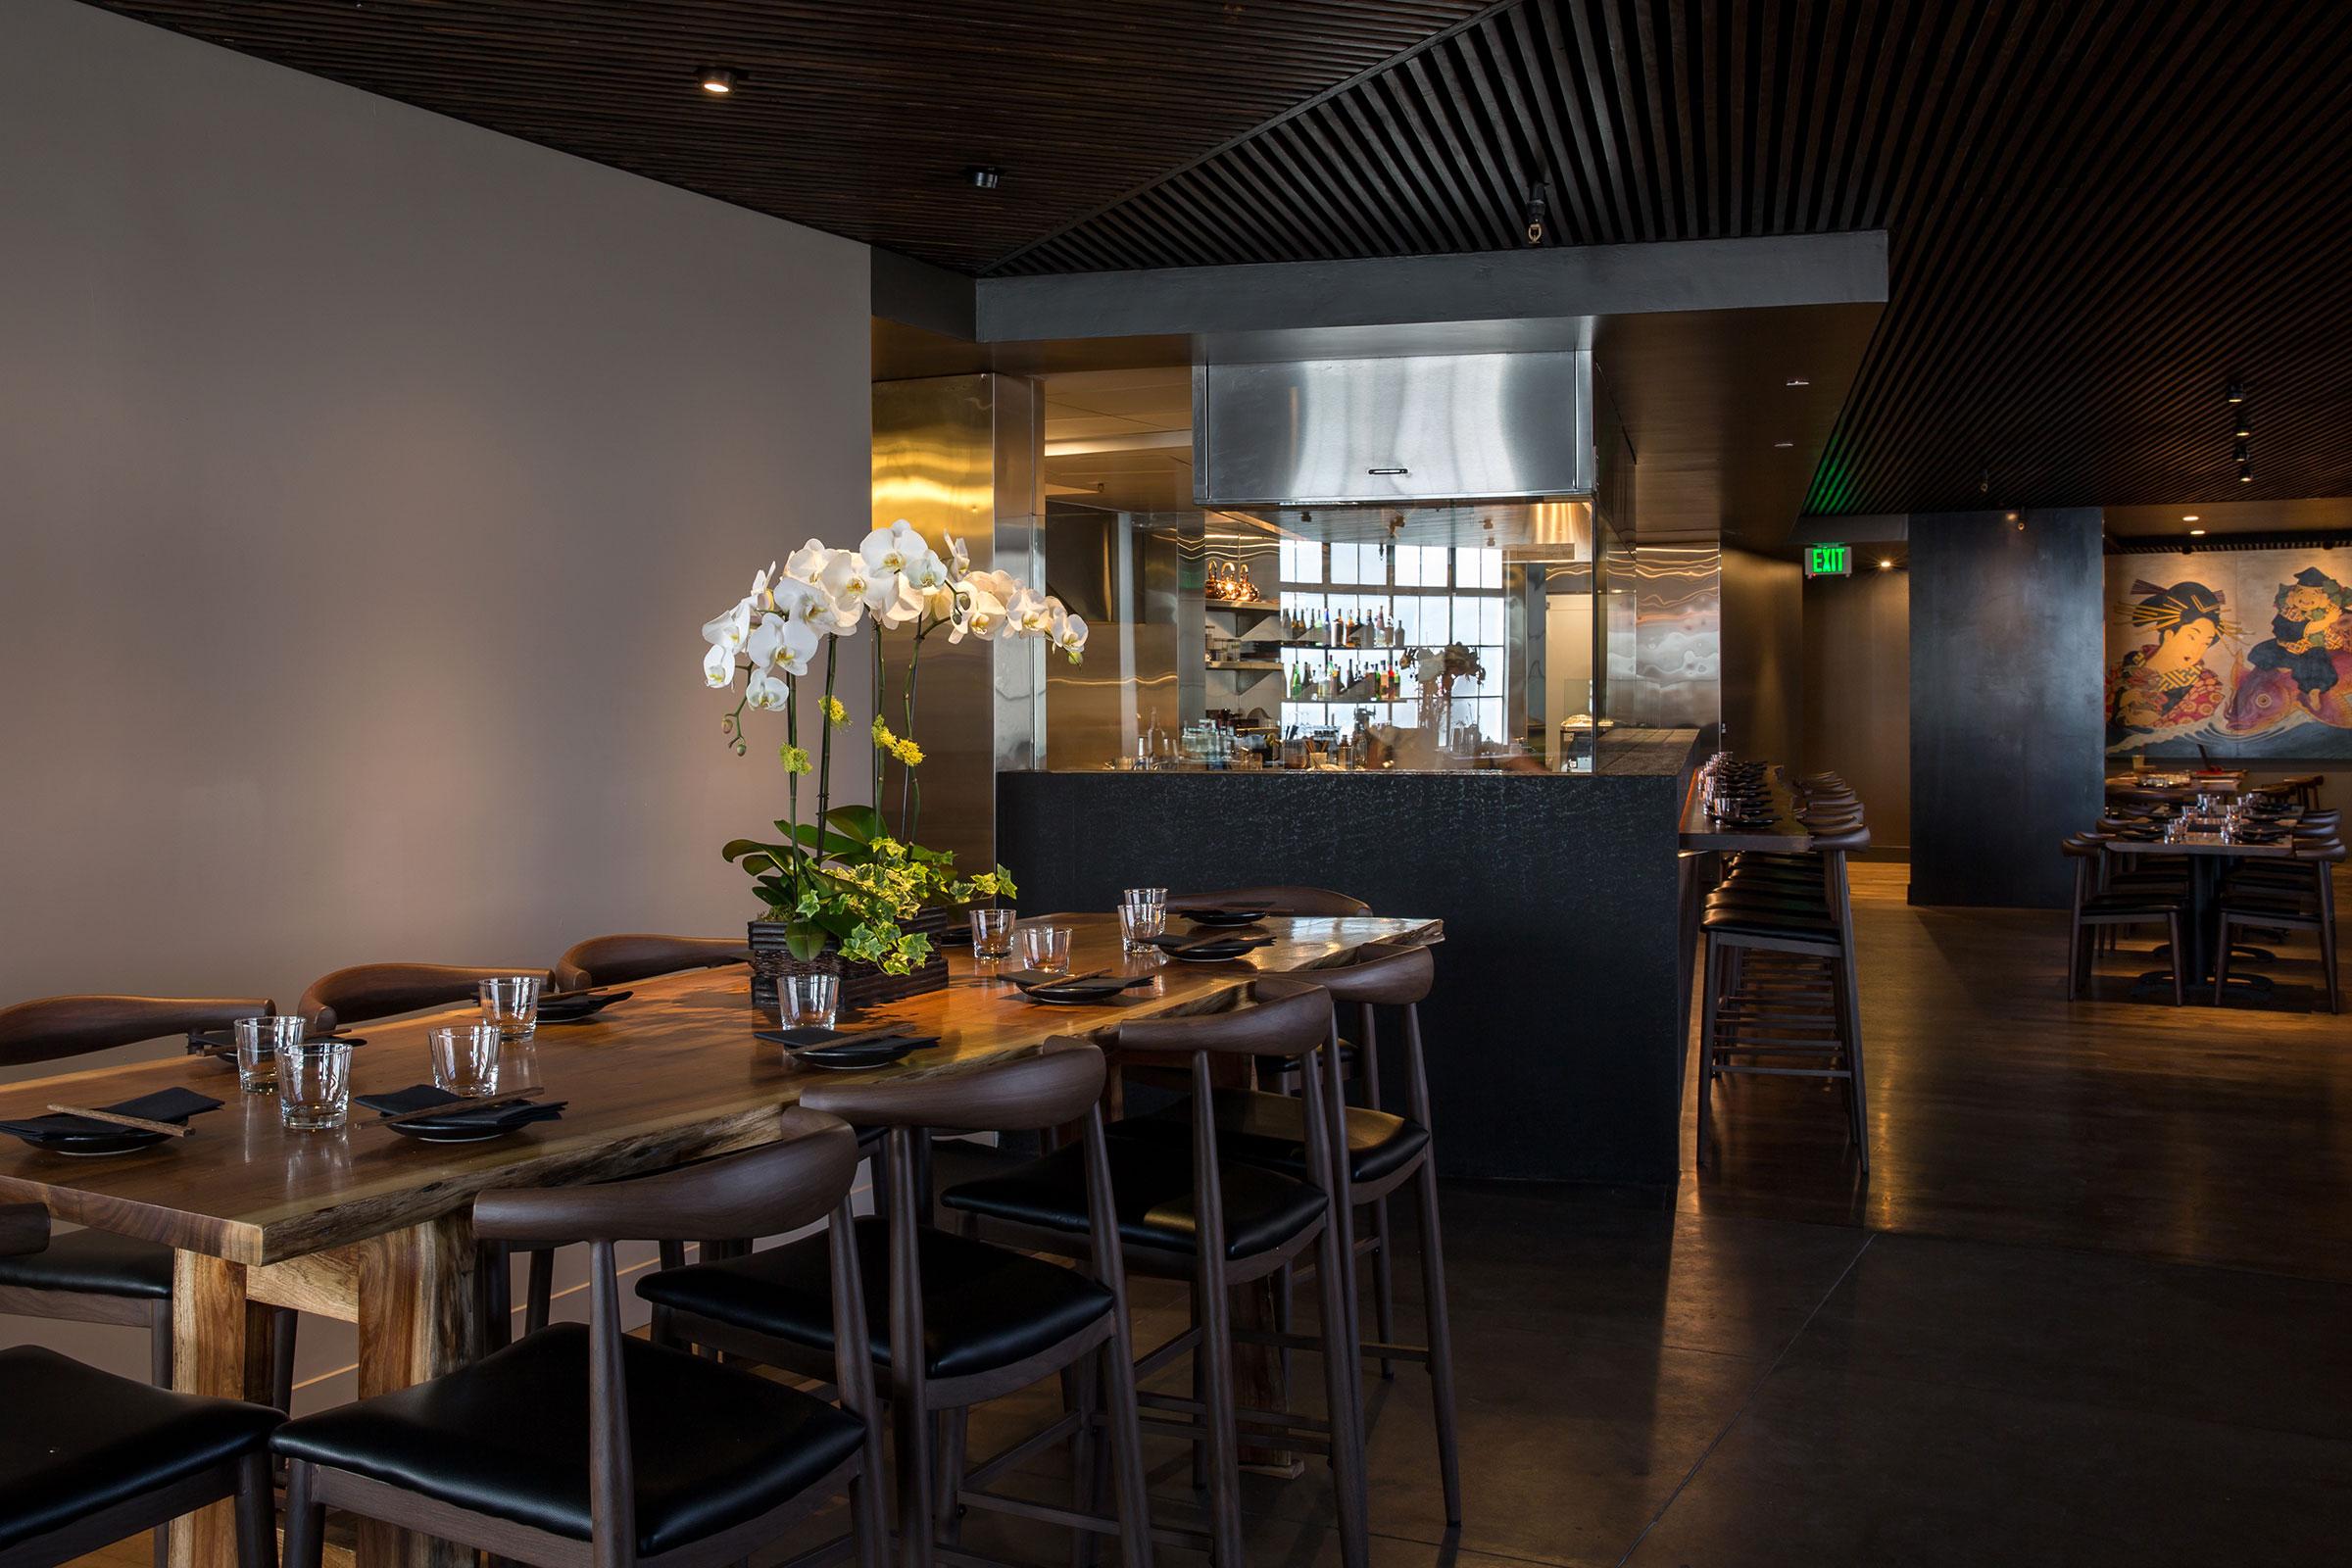 Shinmai Restaurant Dining and Side BarlBuestad Construction